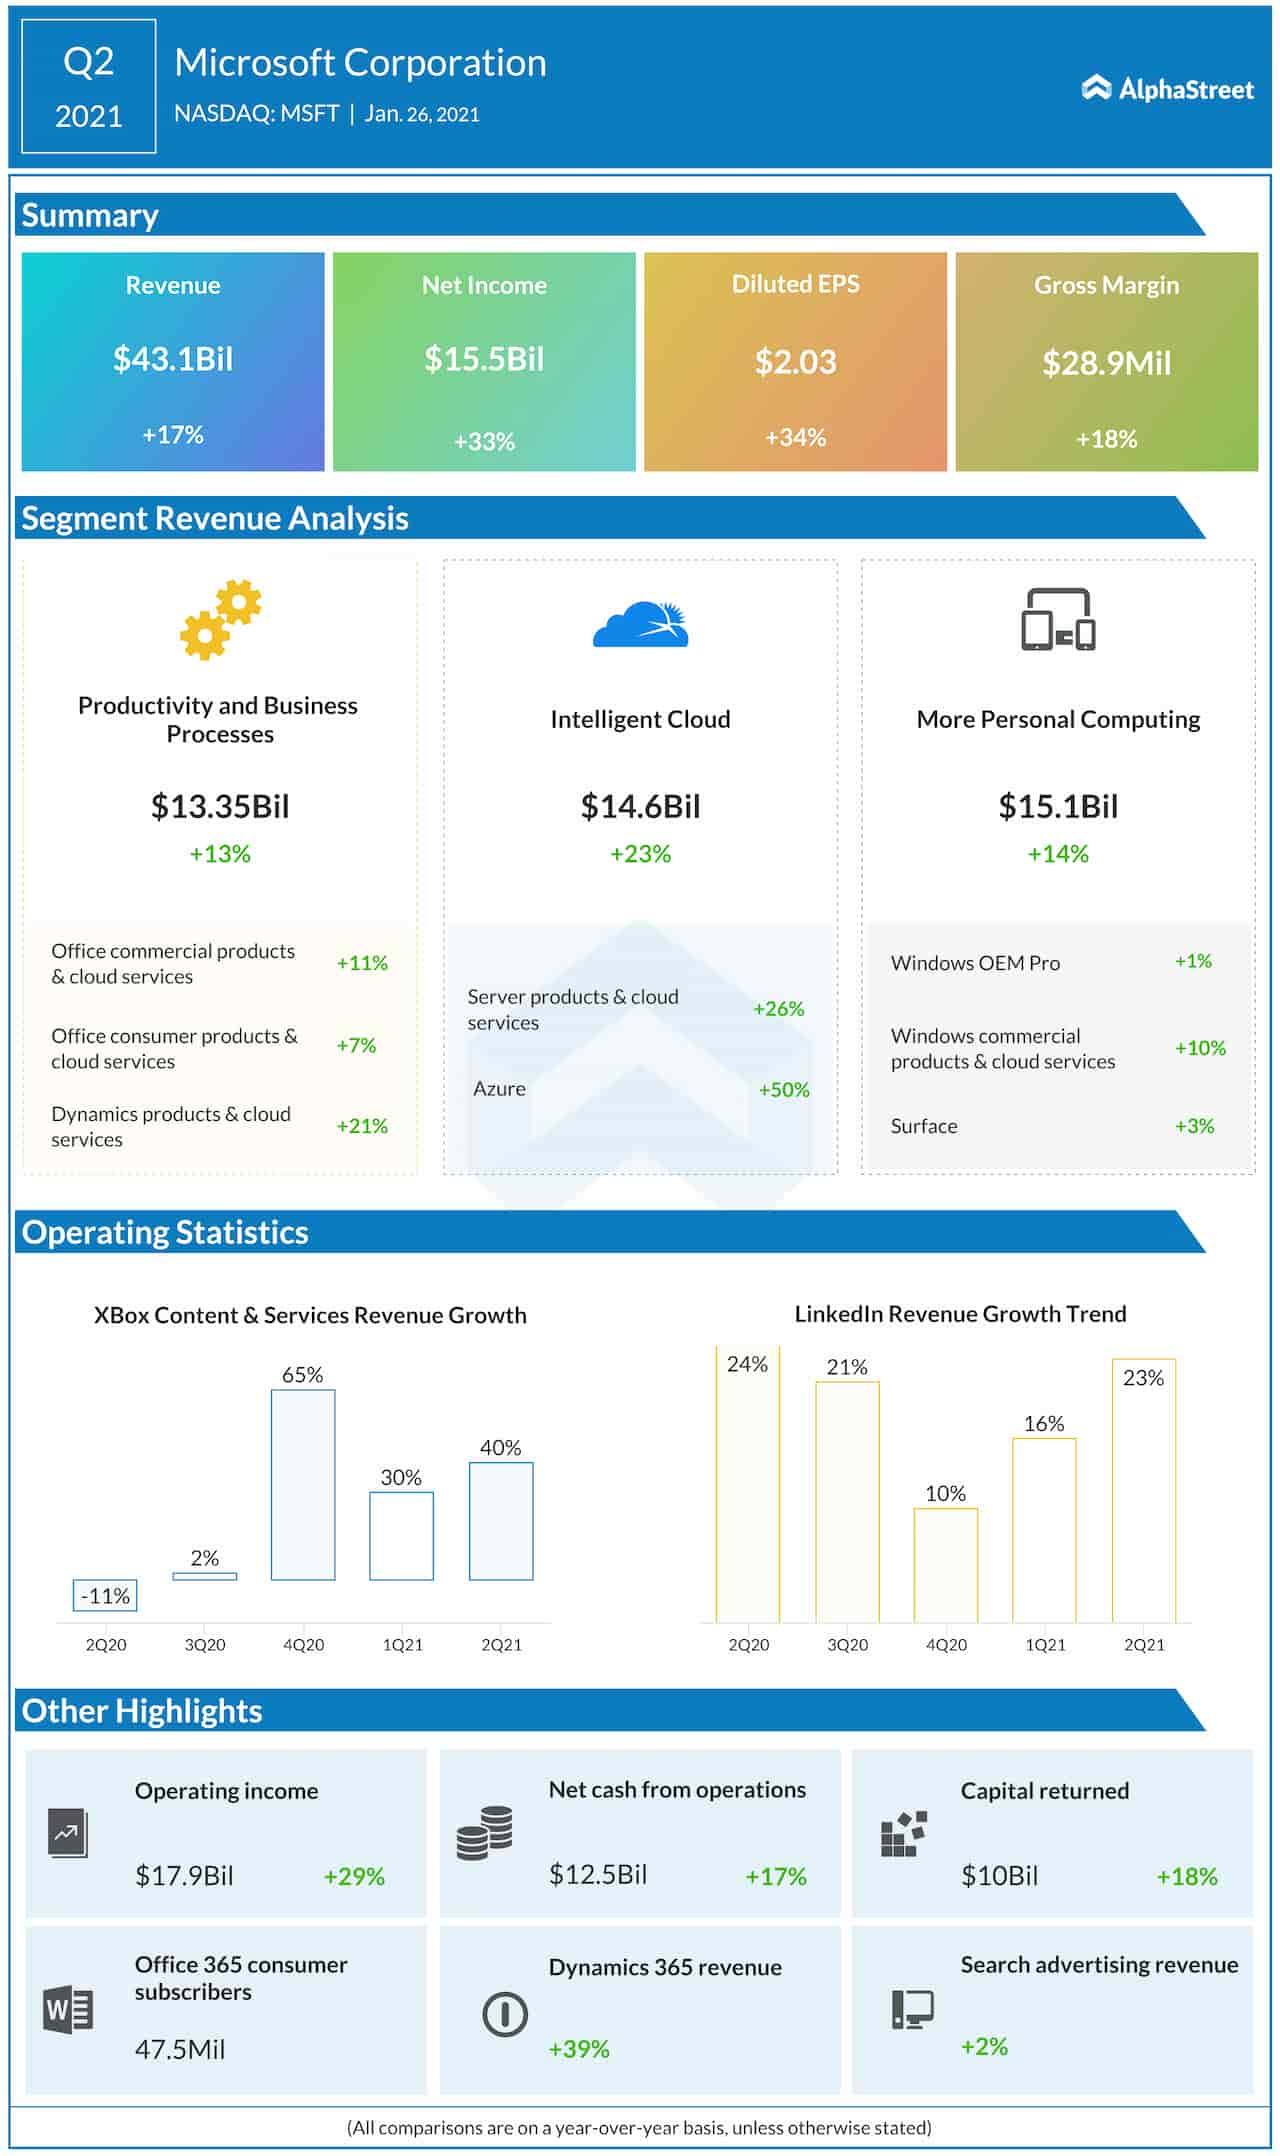 Microsoft Q2 2021 earnings infographic